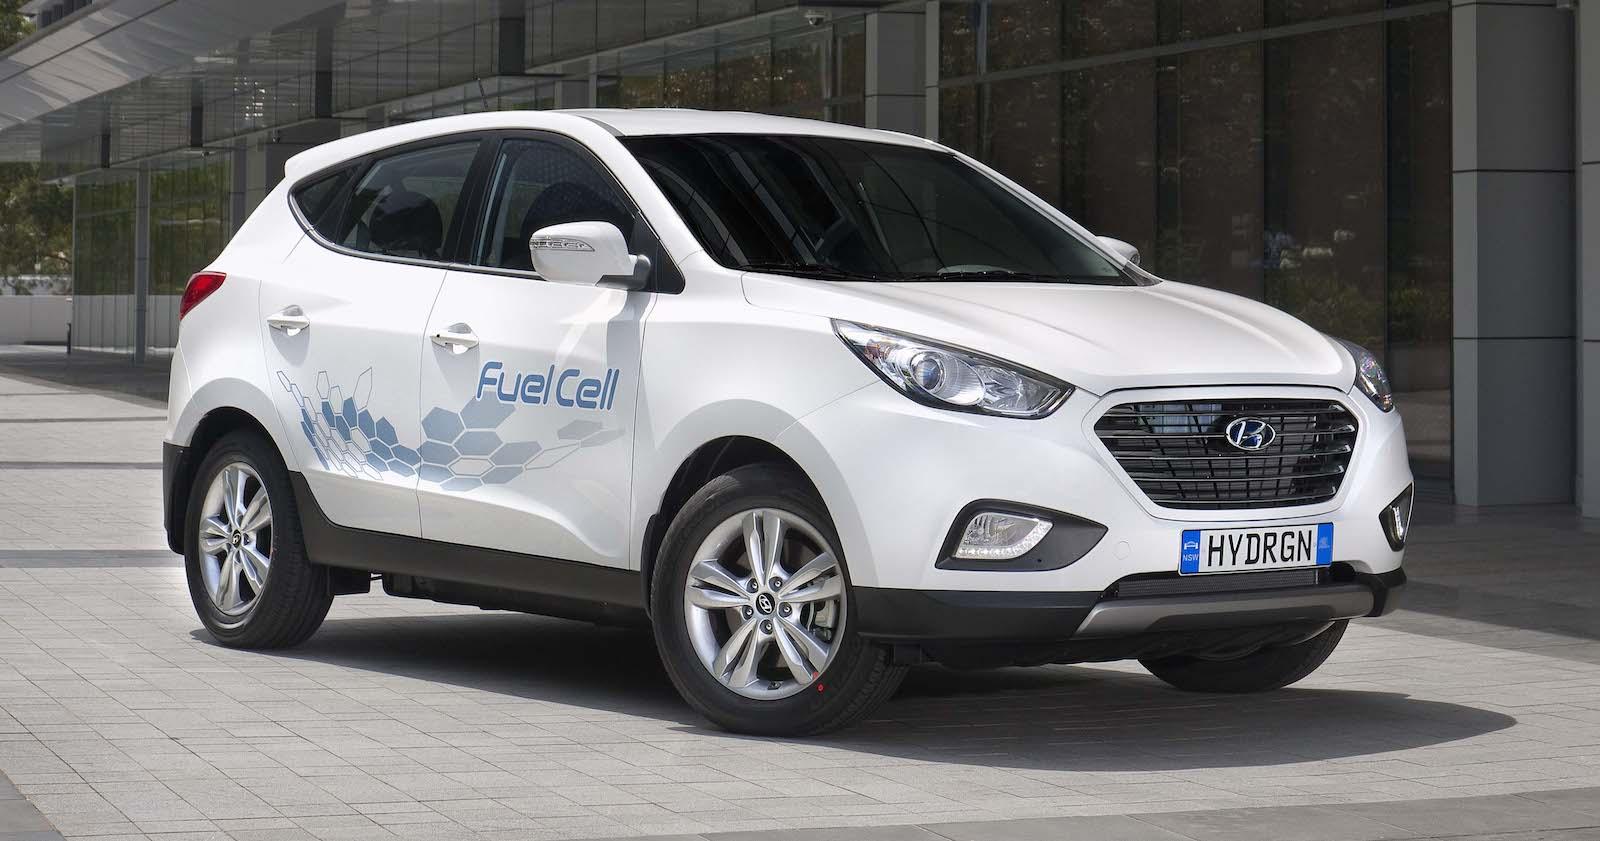 Hyundai Australia confirms 2018 launch date for hydrogen